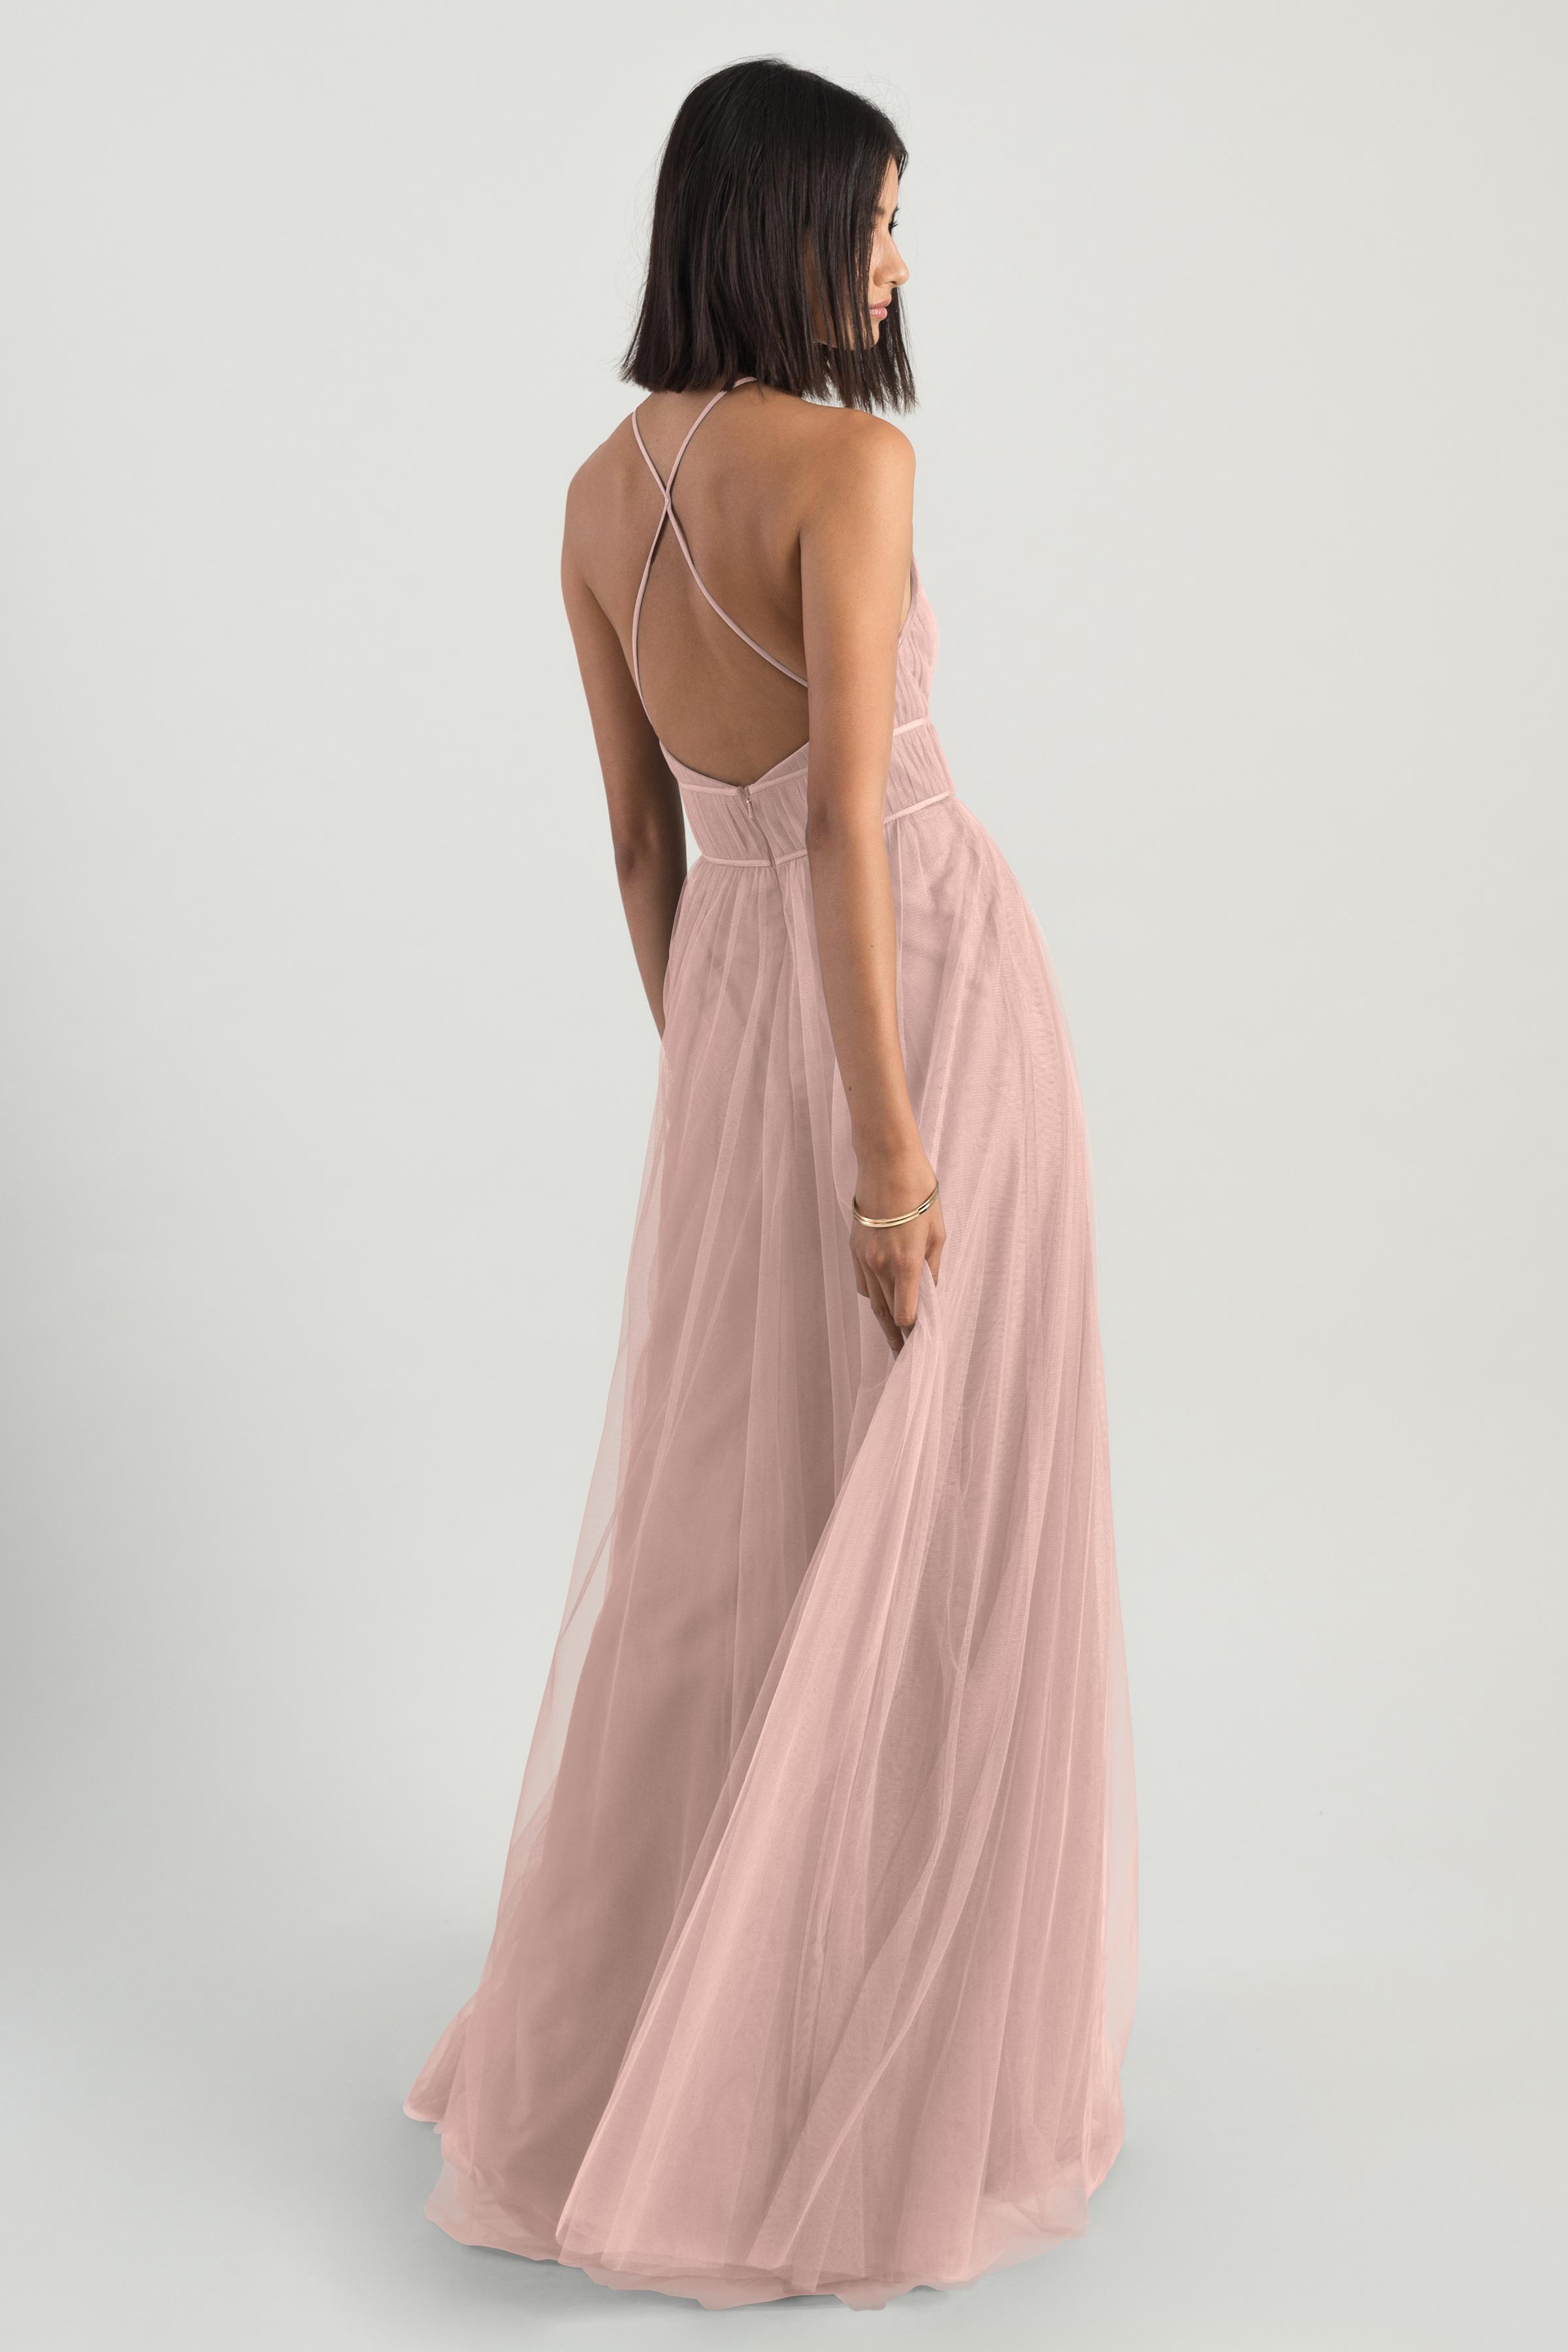 Helena Bridesmaids Dress by Jenny Yoo - Whipped Apricot